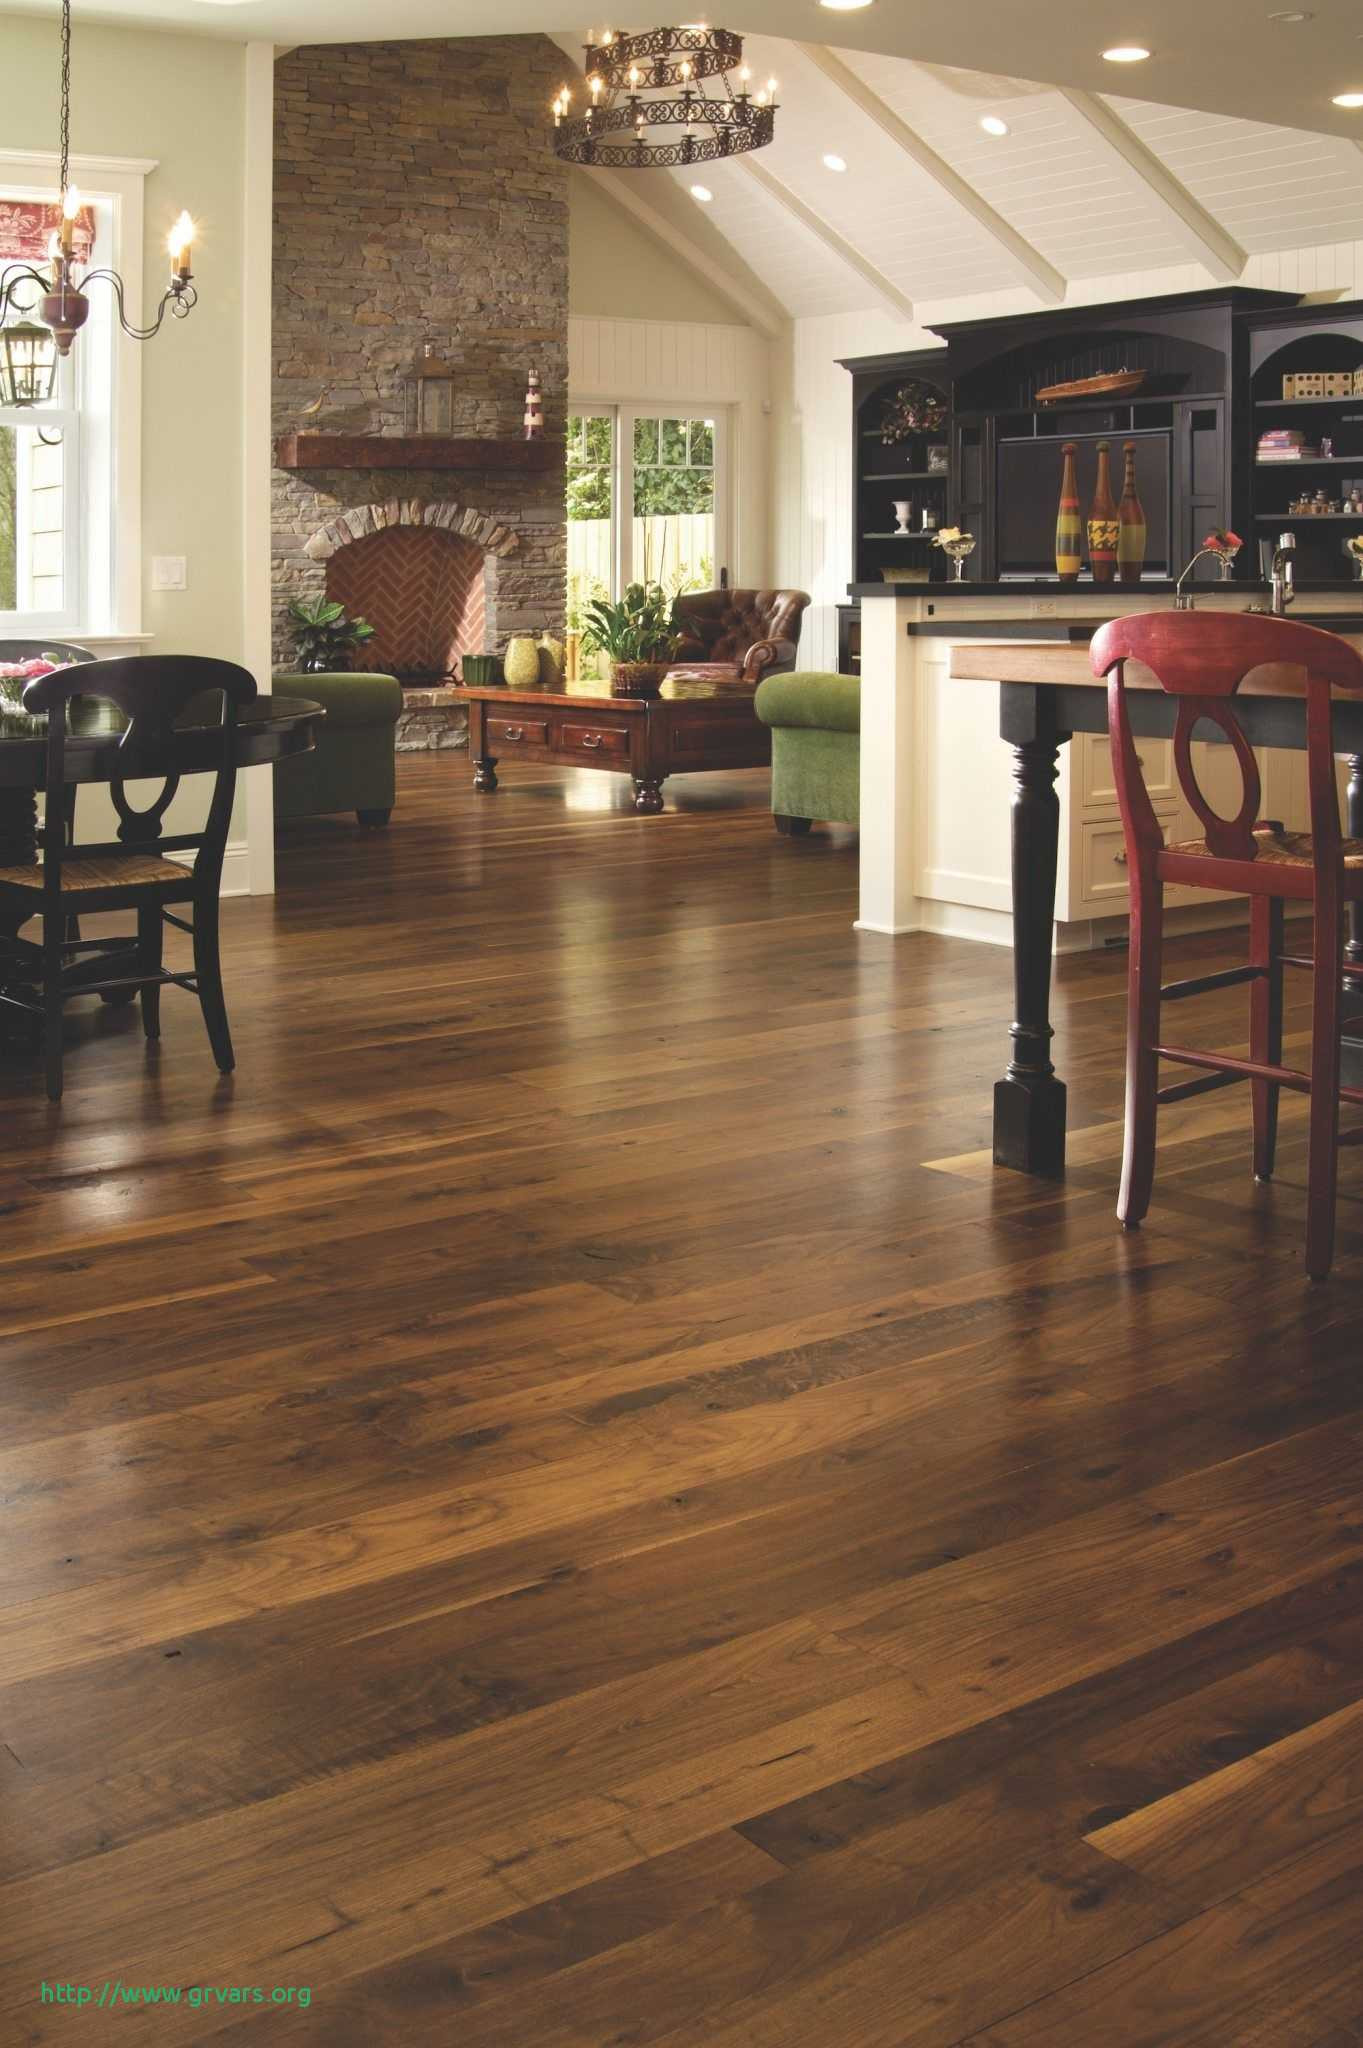 walnut hardwood flooring of wallnut floor charmant walnut flooring in an open concept home with wallnut floor charmant walnut flooring in an open concept home